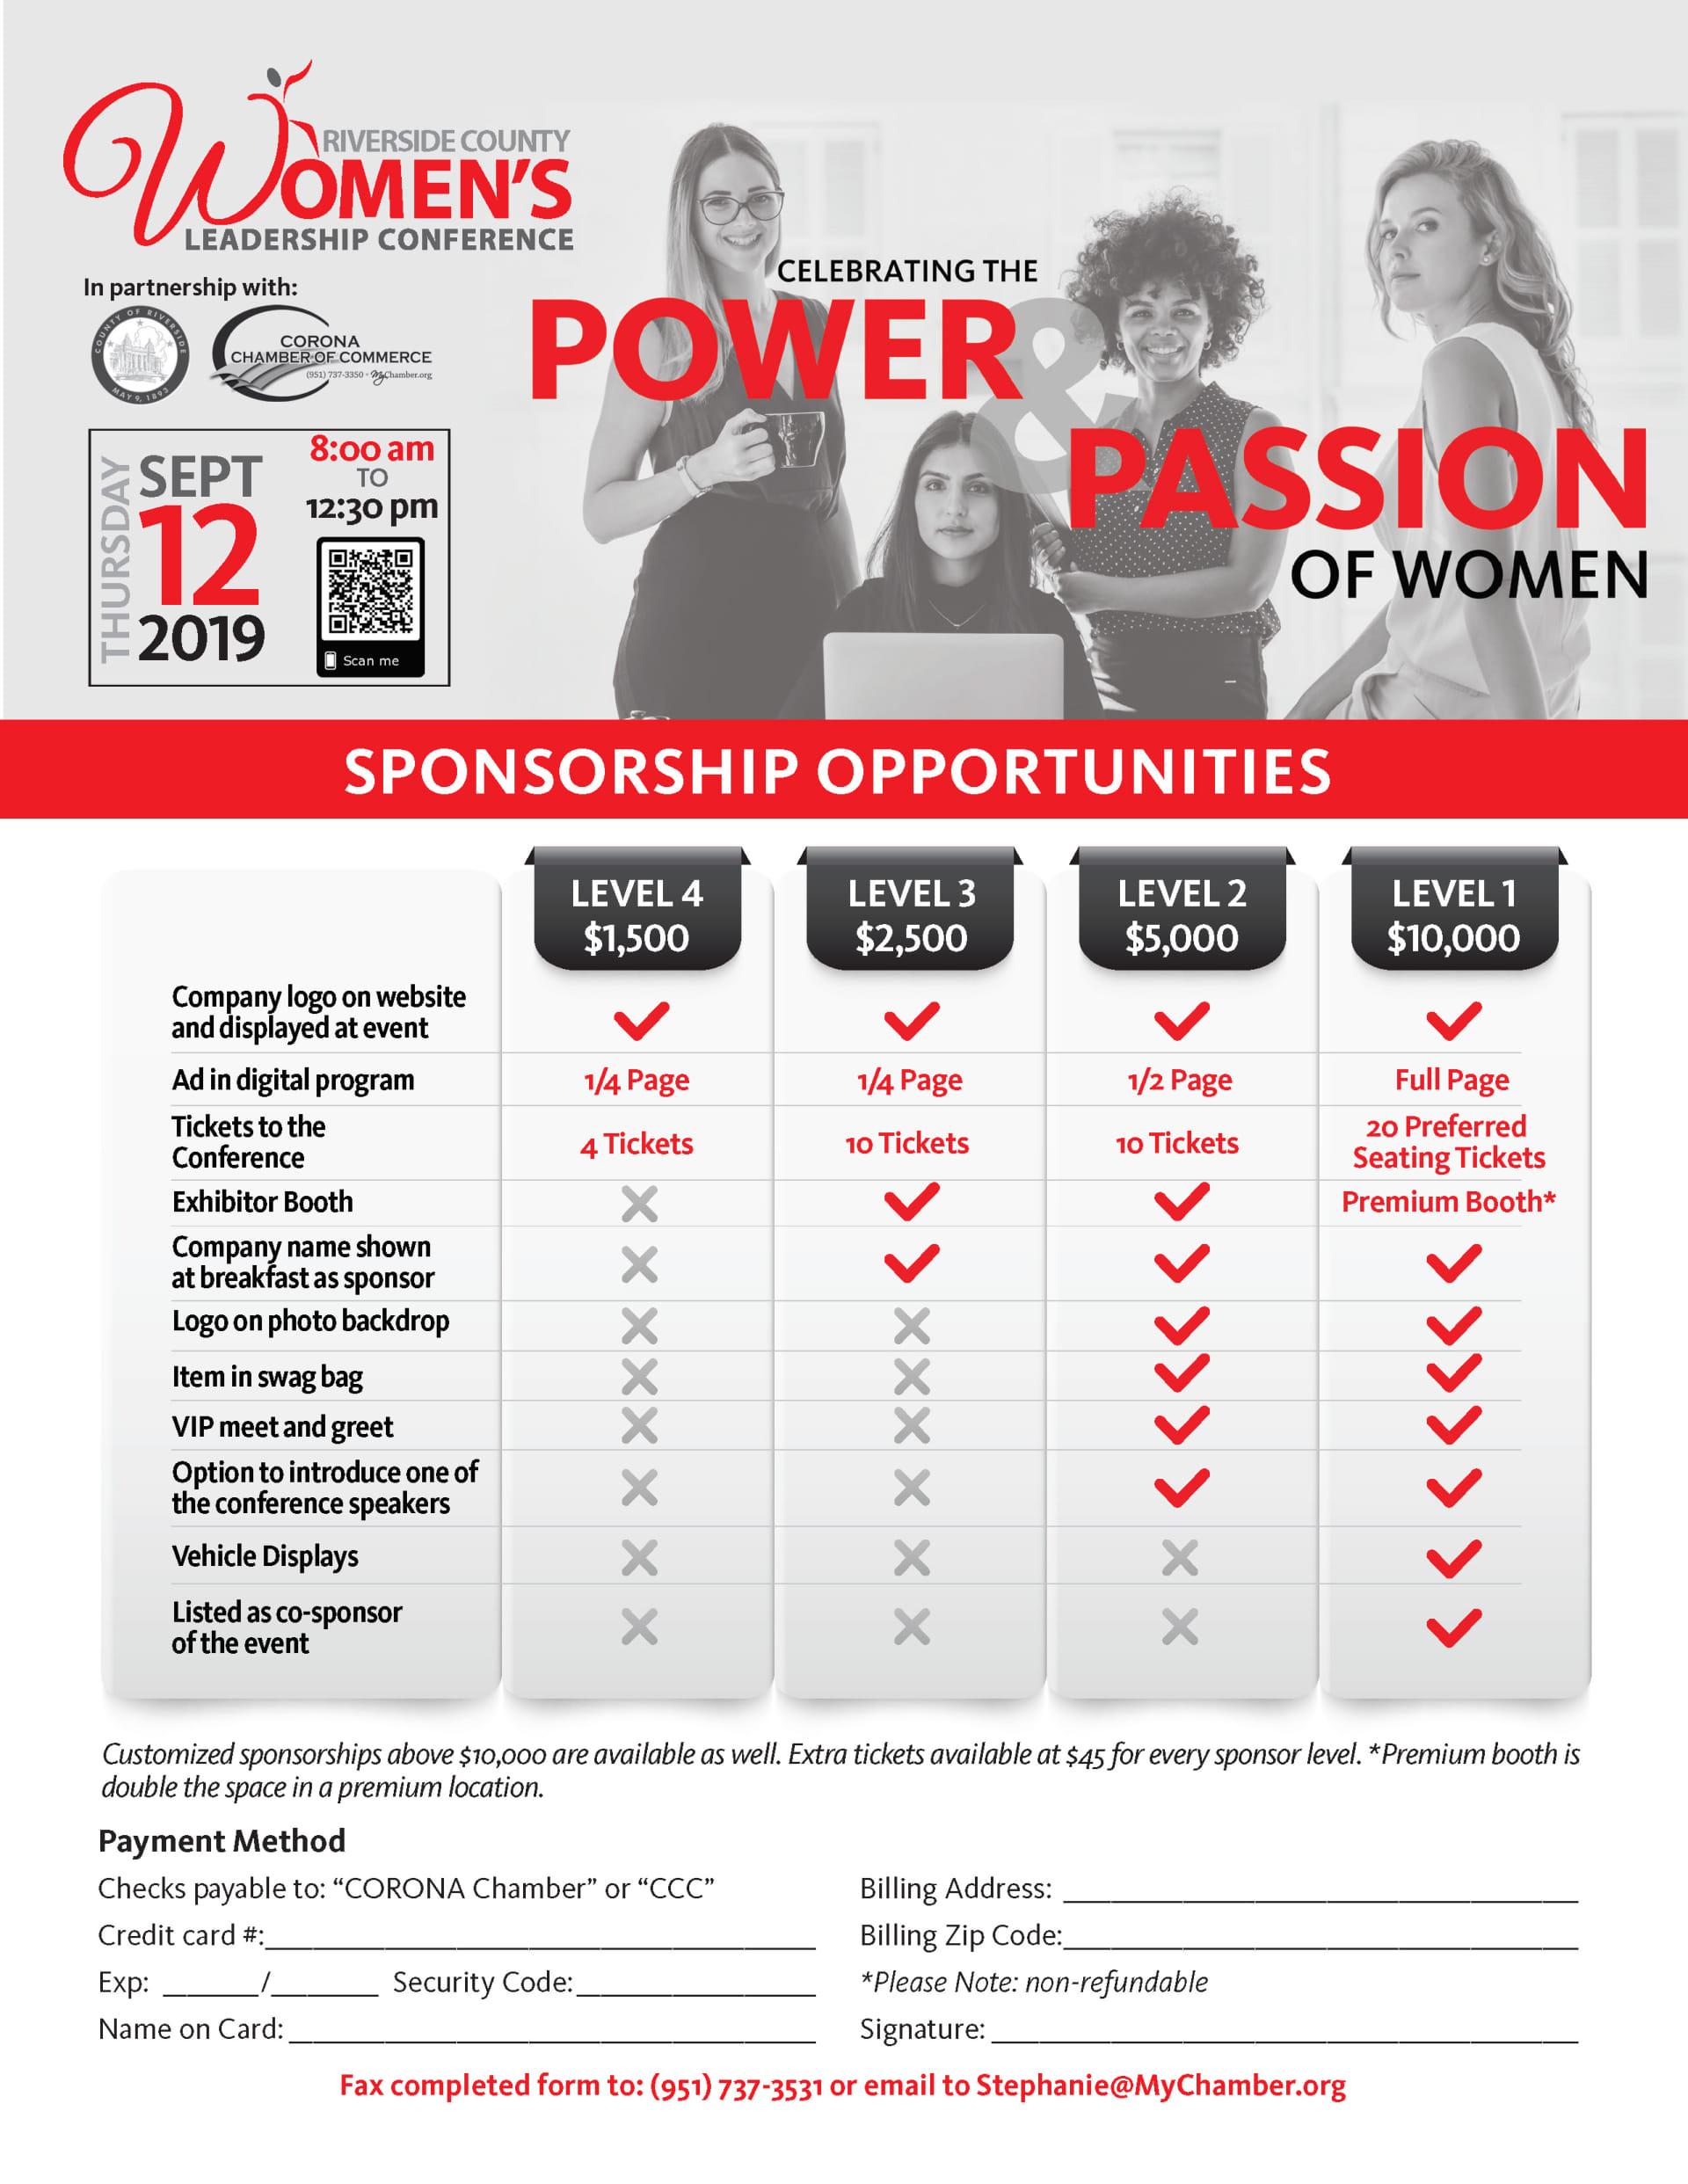 WLC2019_Sponsorship-w1920.jpg